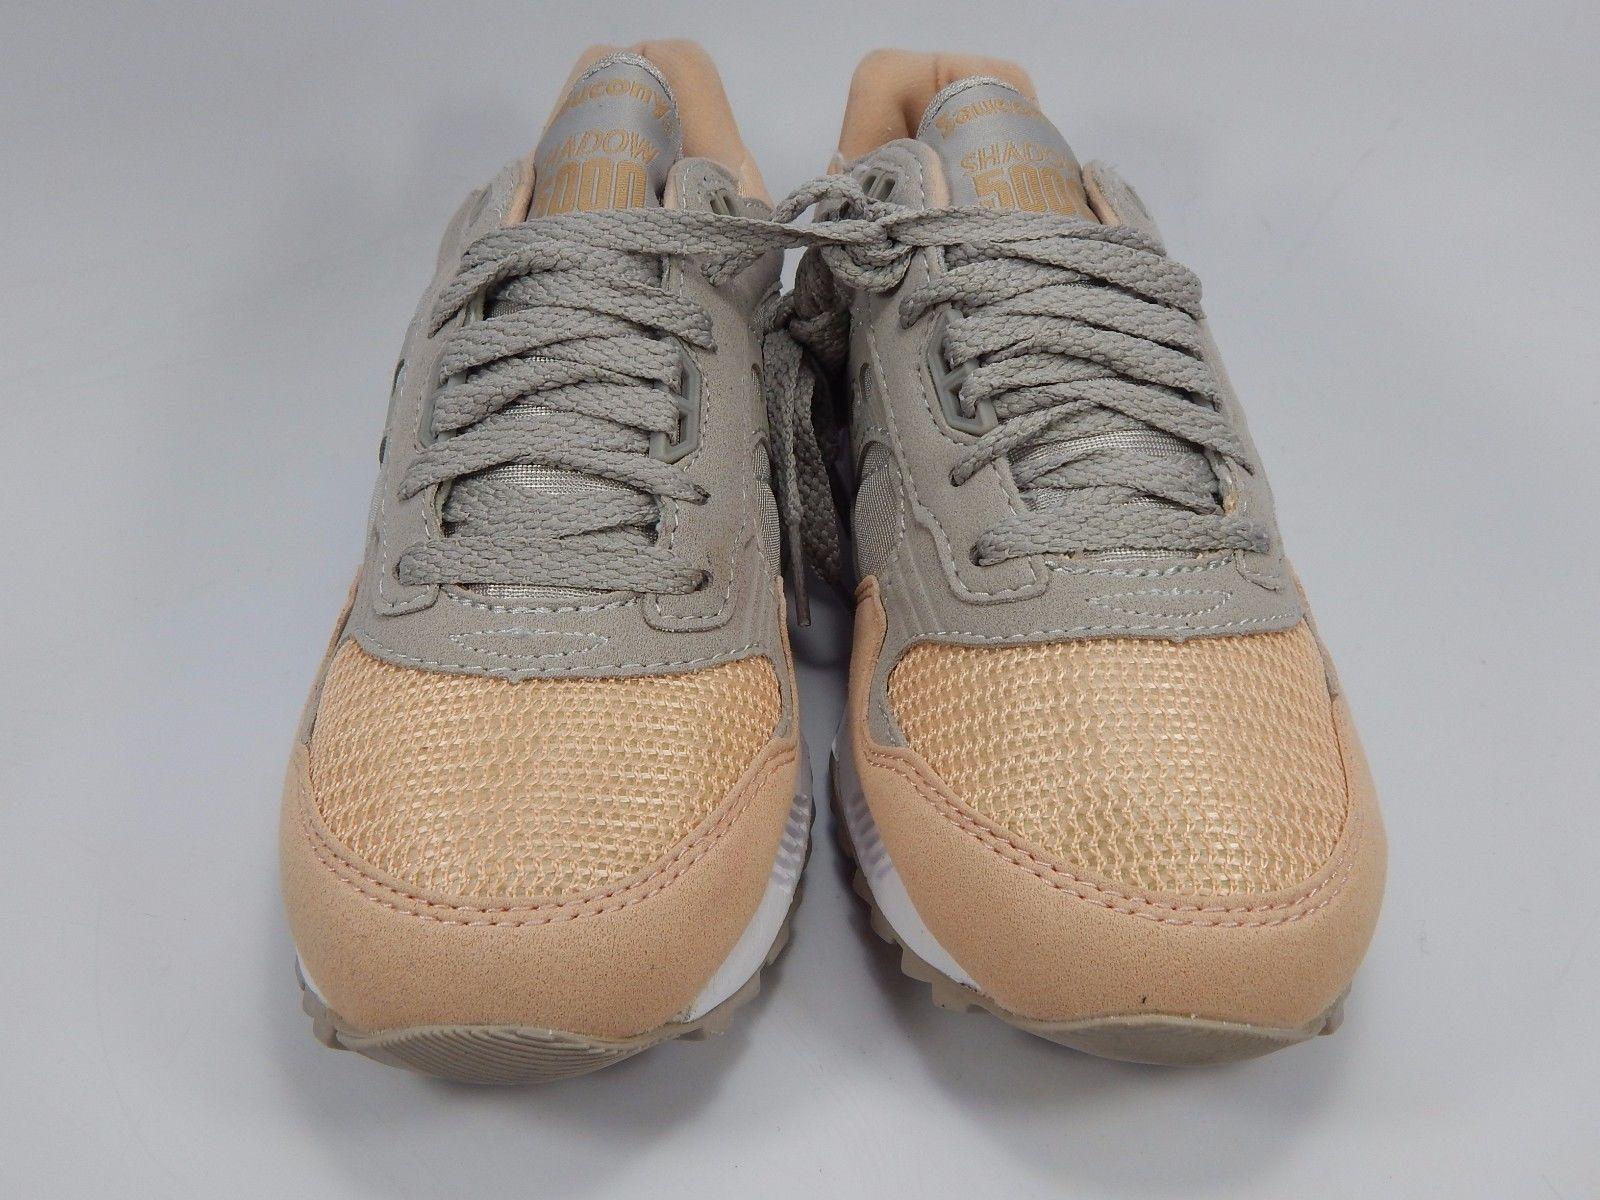 Saucony Original Shadow 5000 Women's Running Shoes Sz US 7 M (B) EU 38 S6033-103